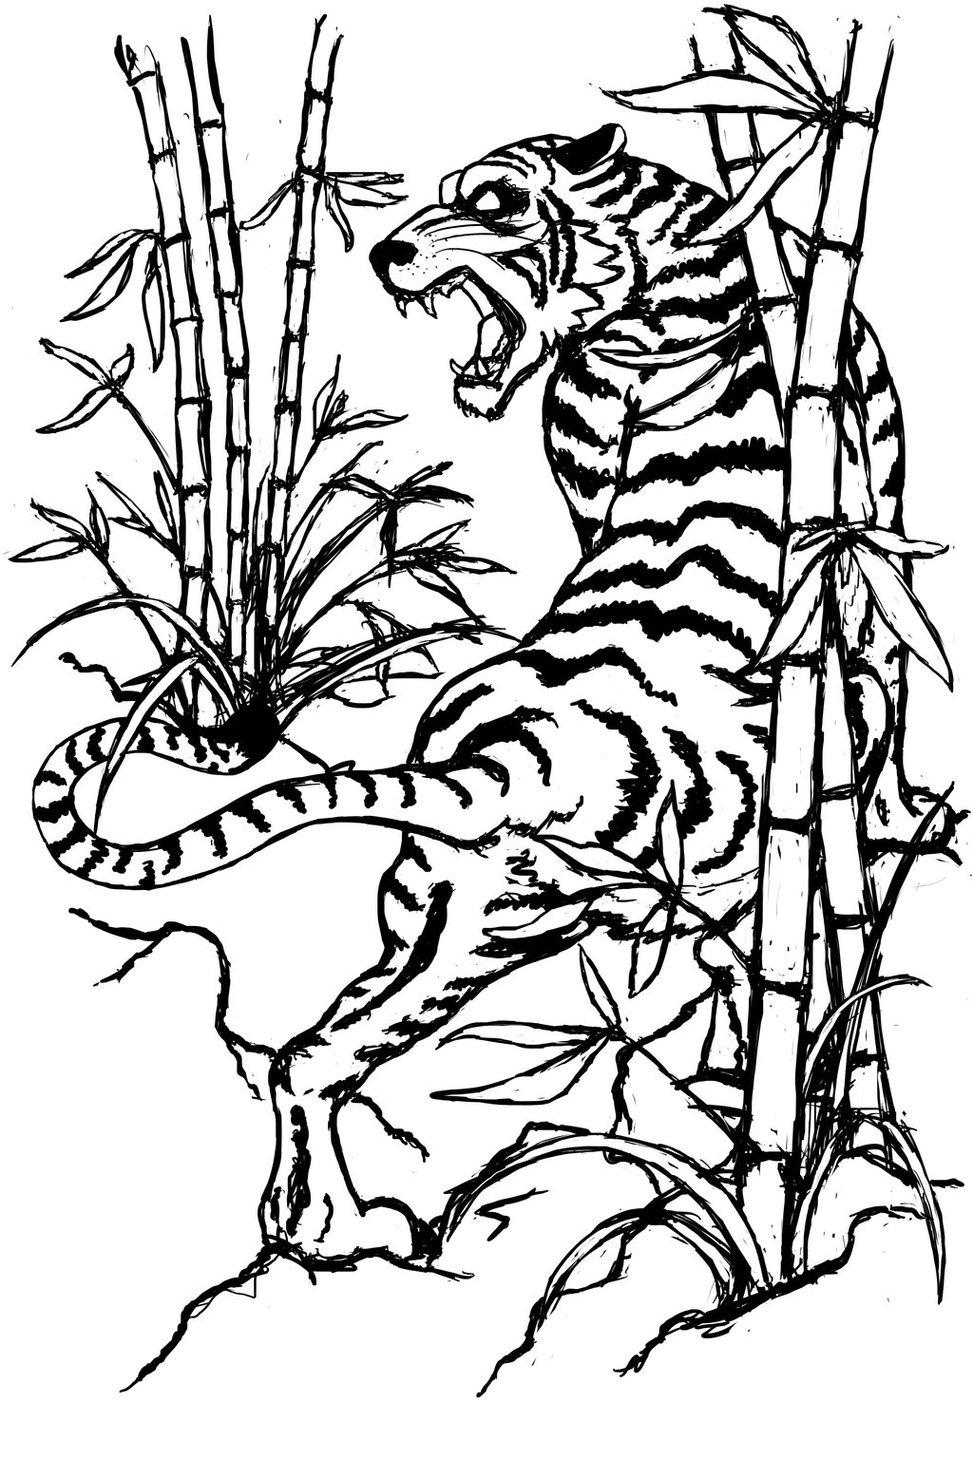 973x1459 Drawn White Tiger Bamboo Drawing